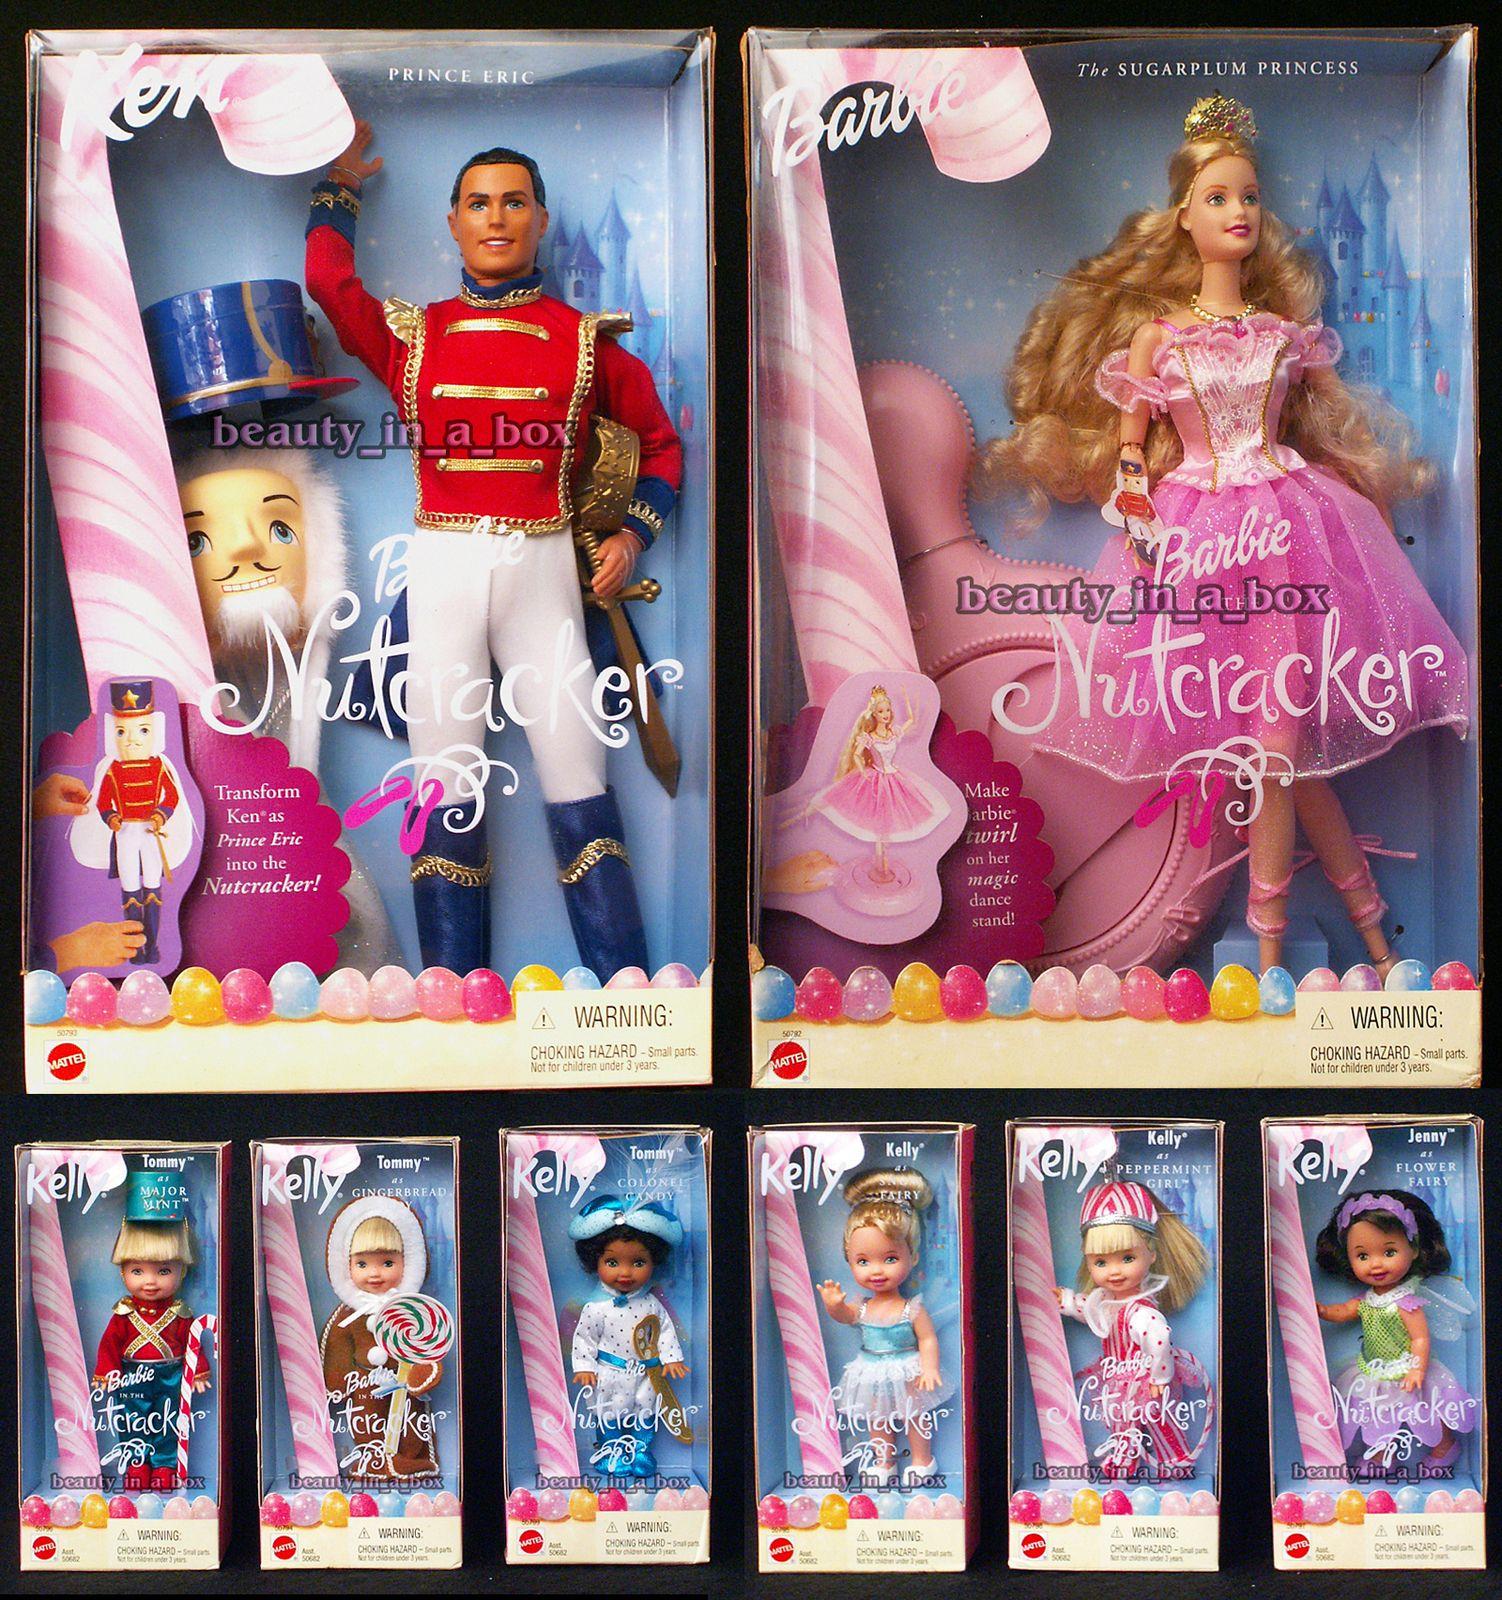 Find great deals on ebay for barbie hair extensions doll barbie light - Sugarplum Princess Barbie Prince Eric Ken Kelly Ballerina Nutcracker Ballet Doll Ebay